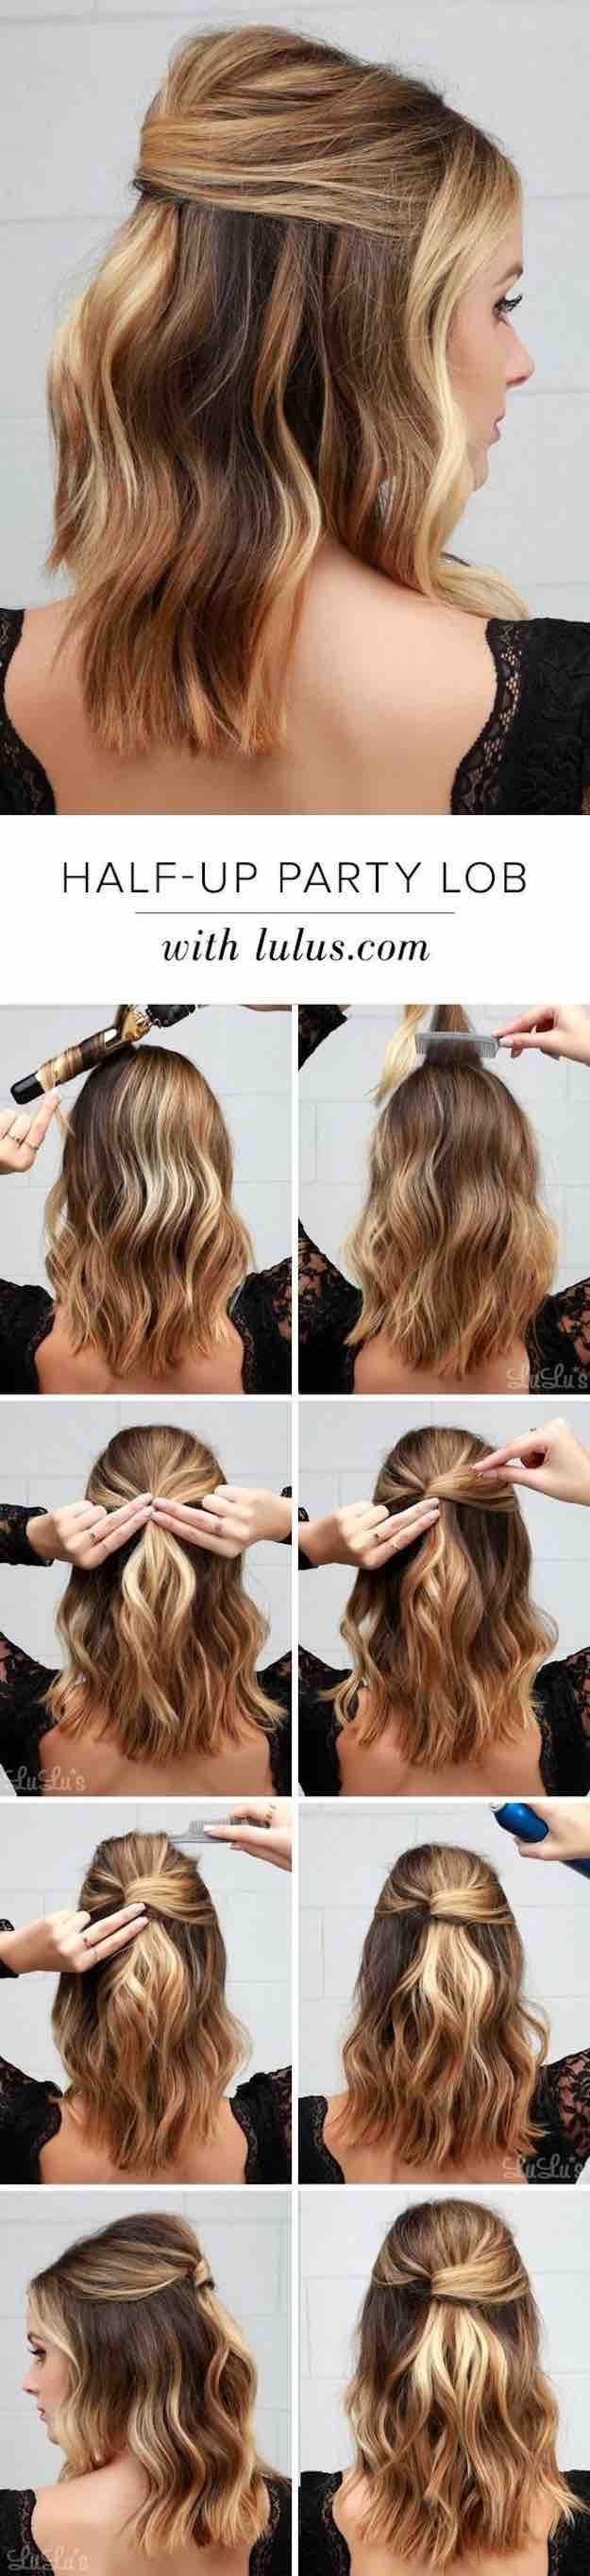 best hair u beauty that i love images on pinterest hair cut